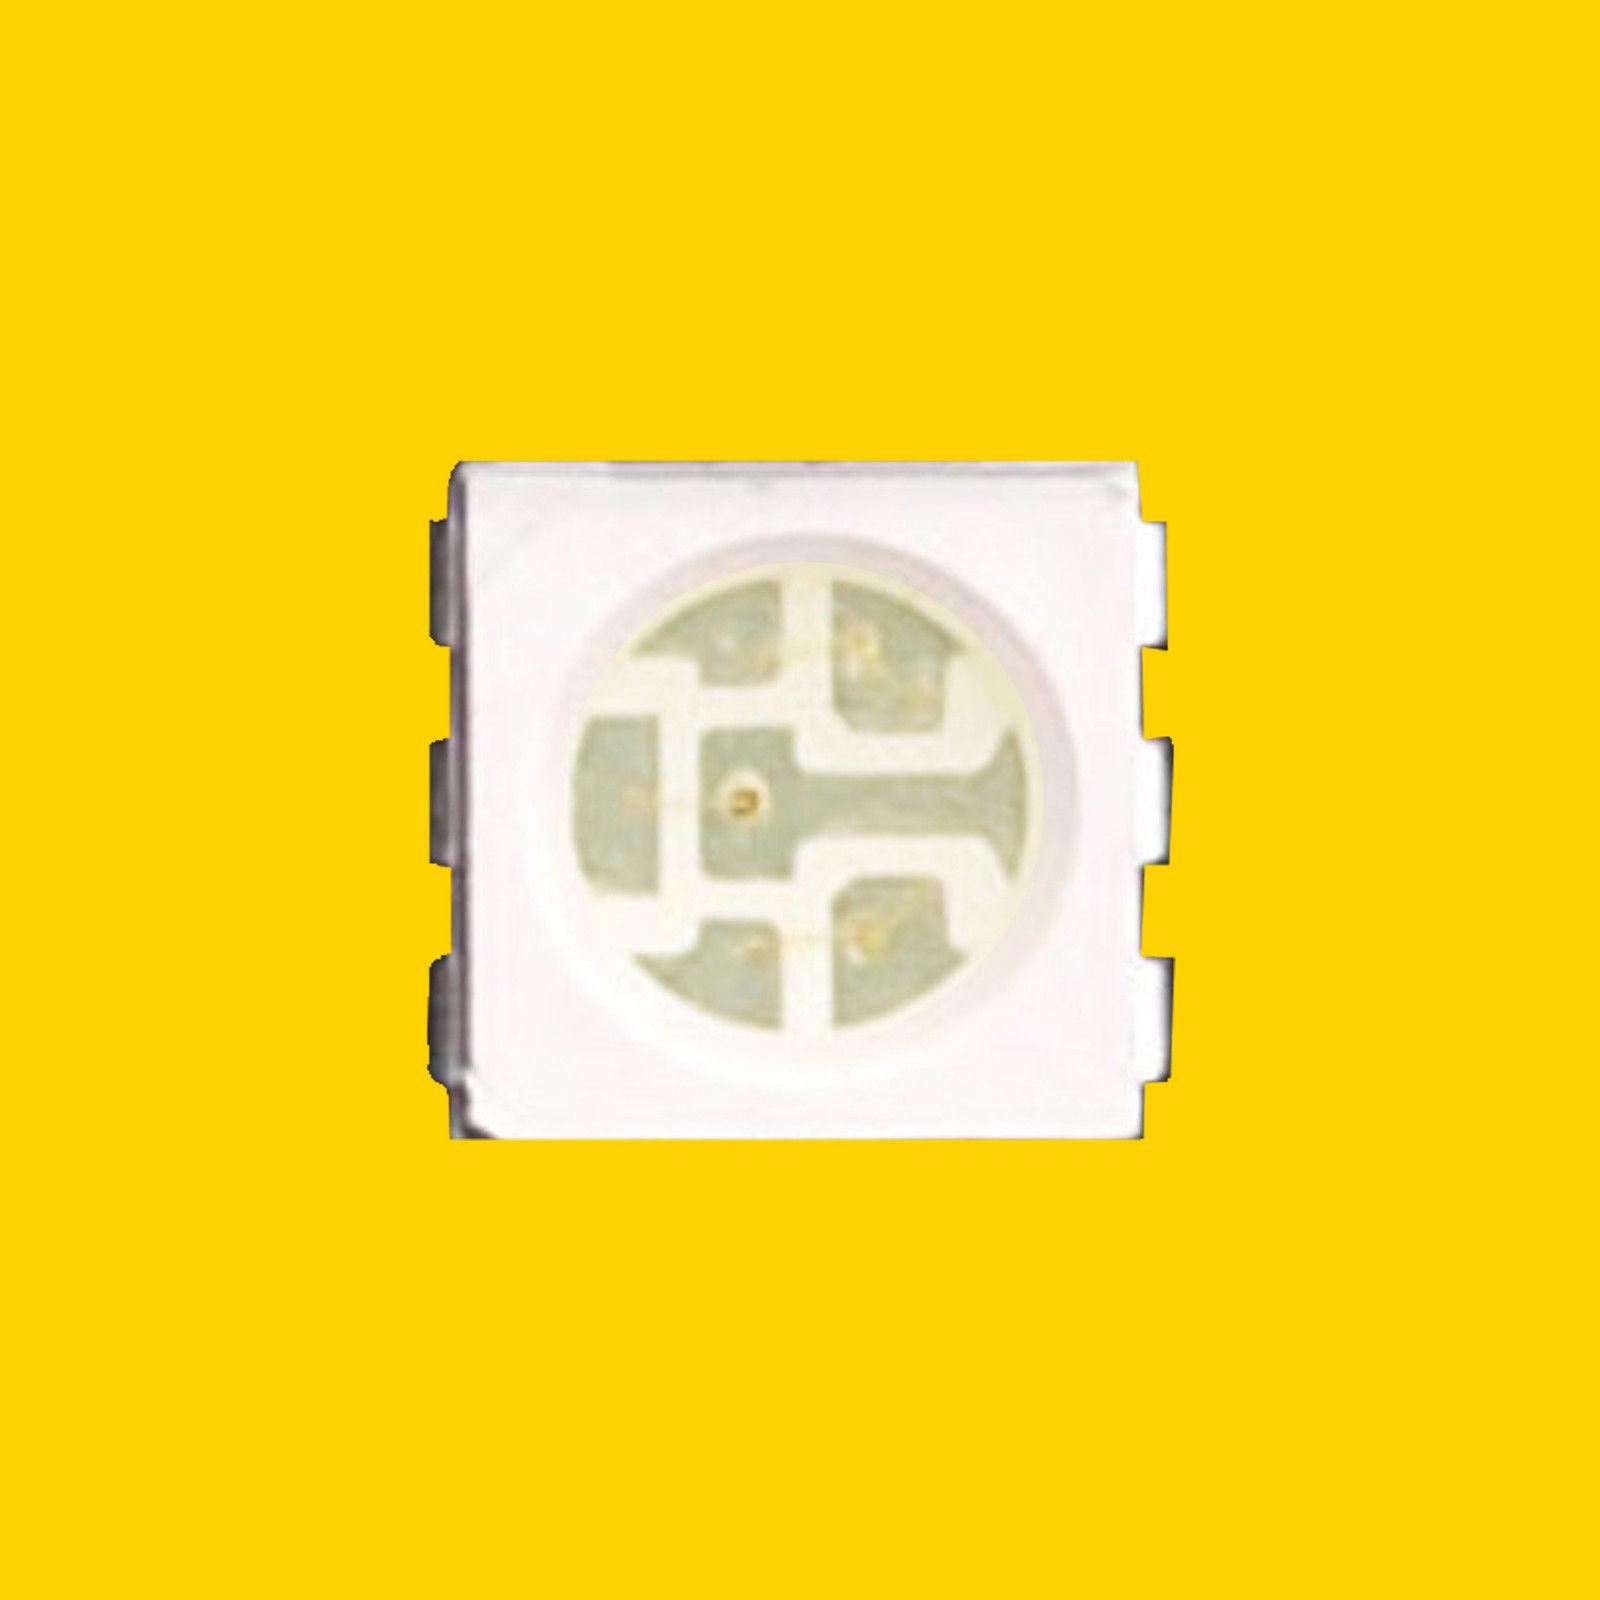 SMT LED Chip 10 x White 5050 PLCC-6 SMD